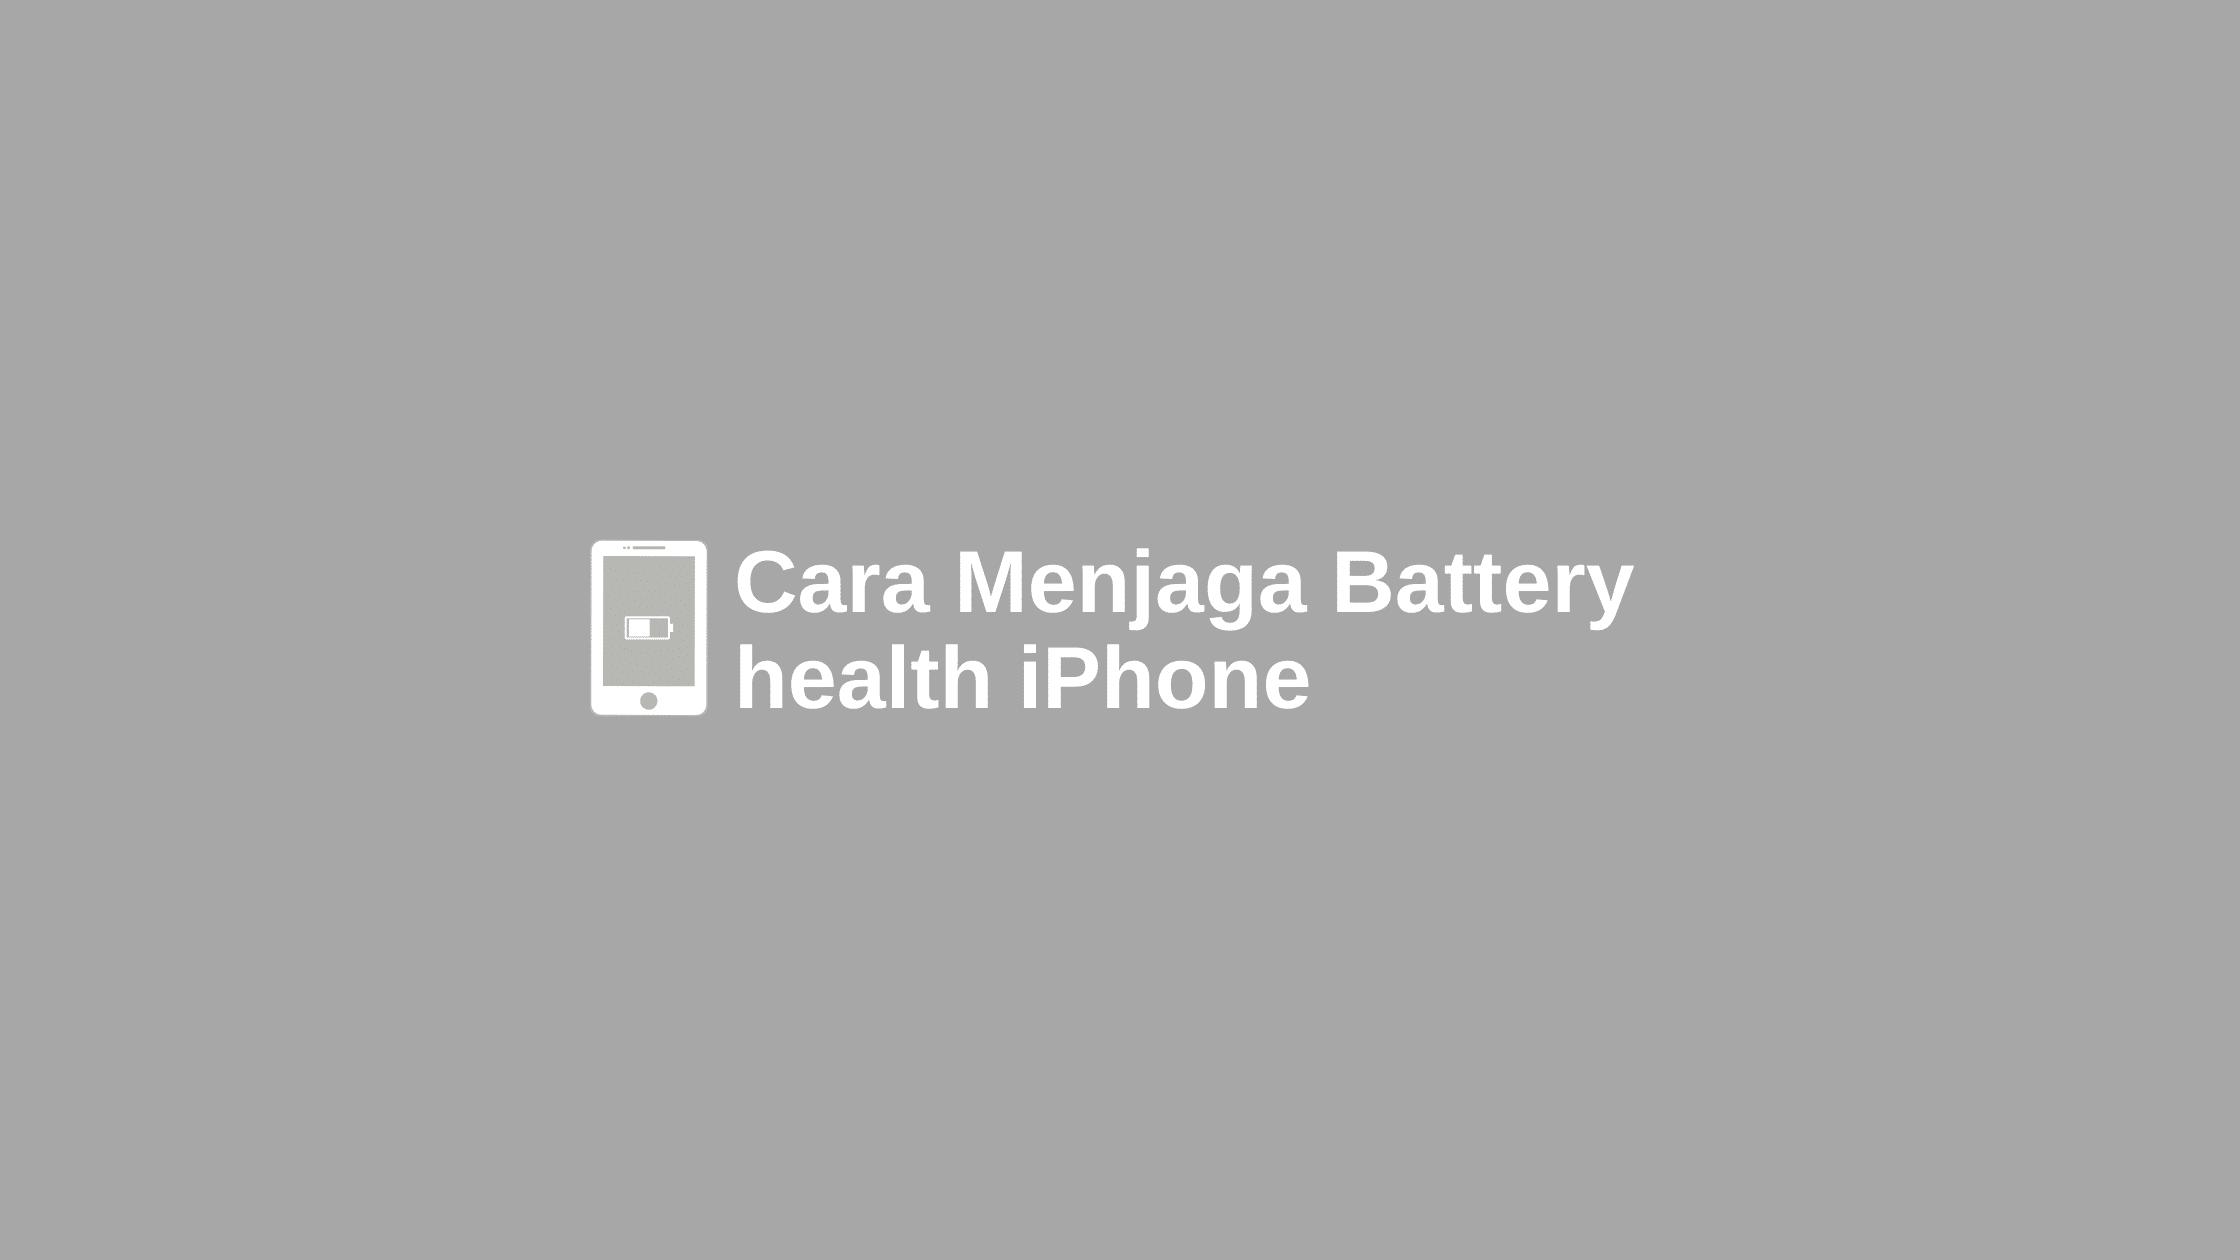 cara menjaga battery health iphone